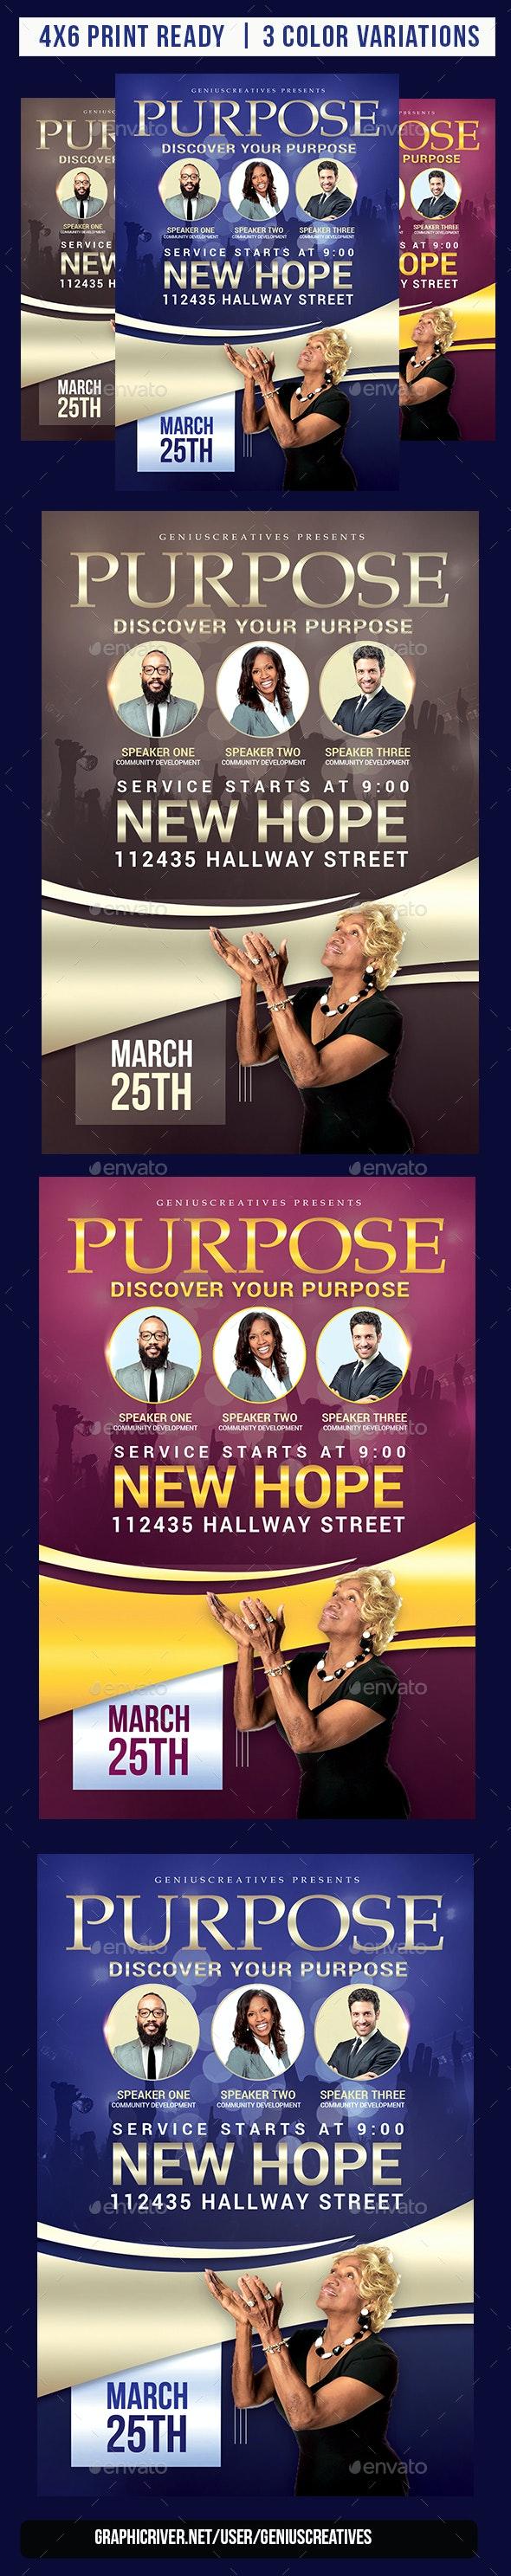 Purpose Church Flyer Template - Church Flyers